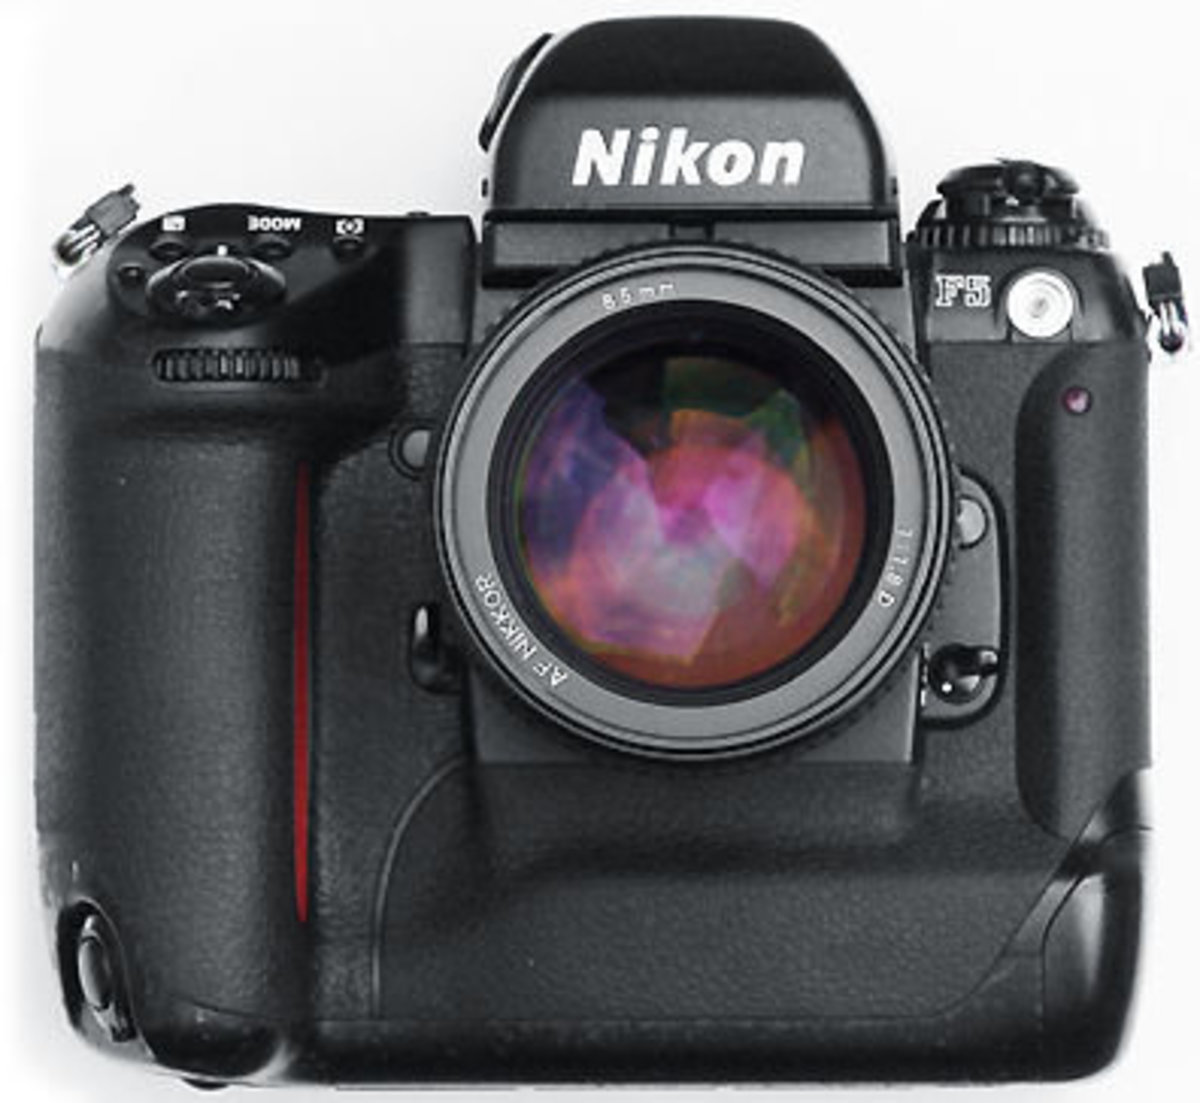 Nikon F5 - the ultimate 35mm film camera?